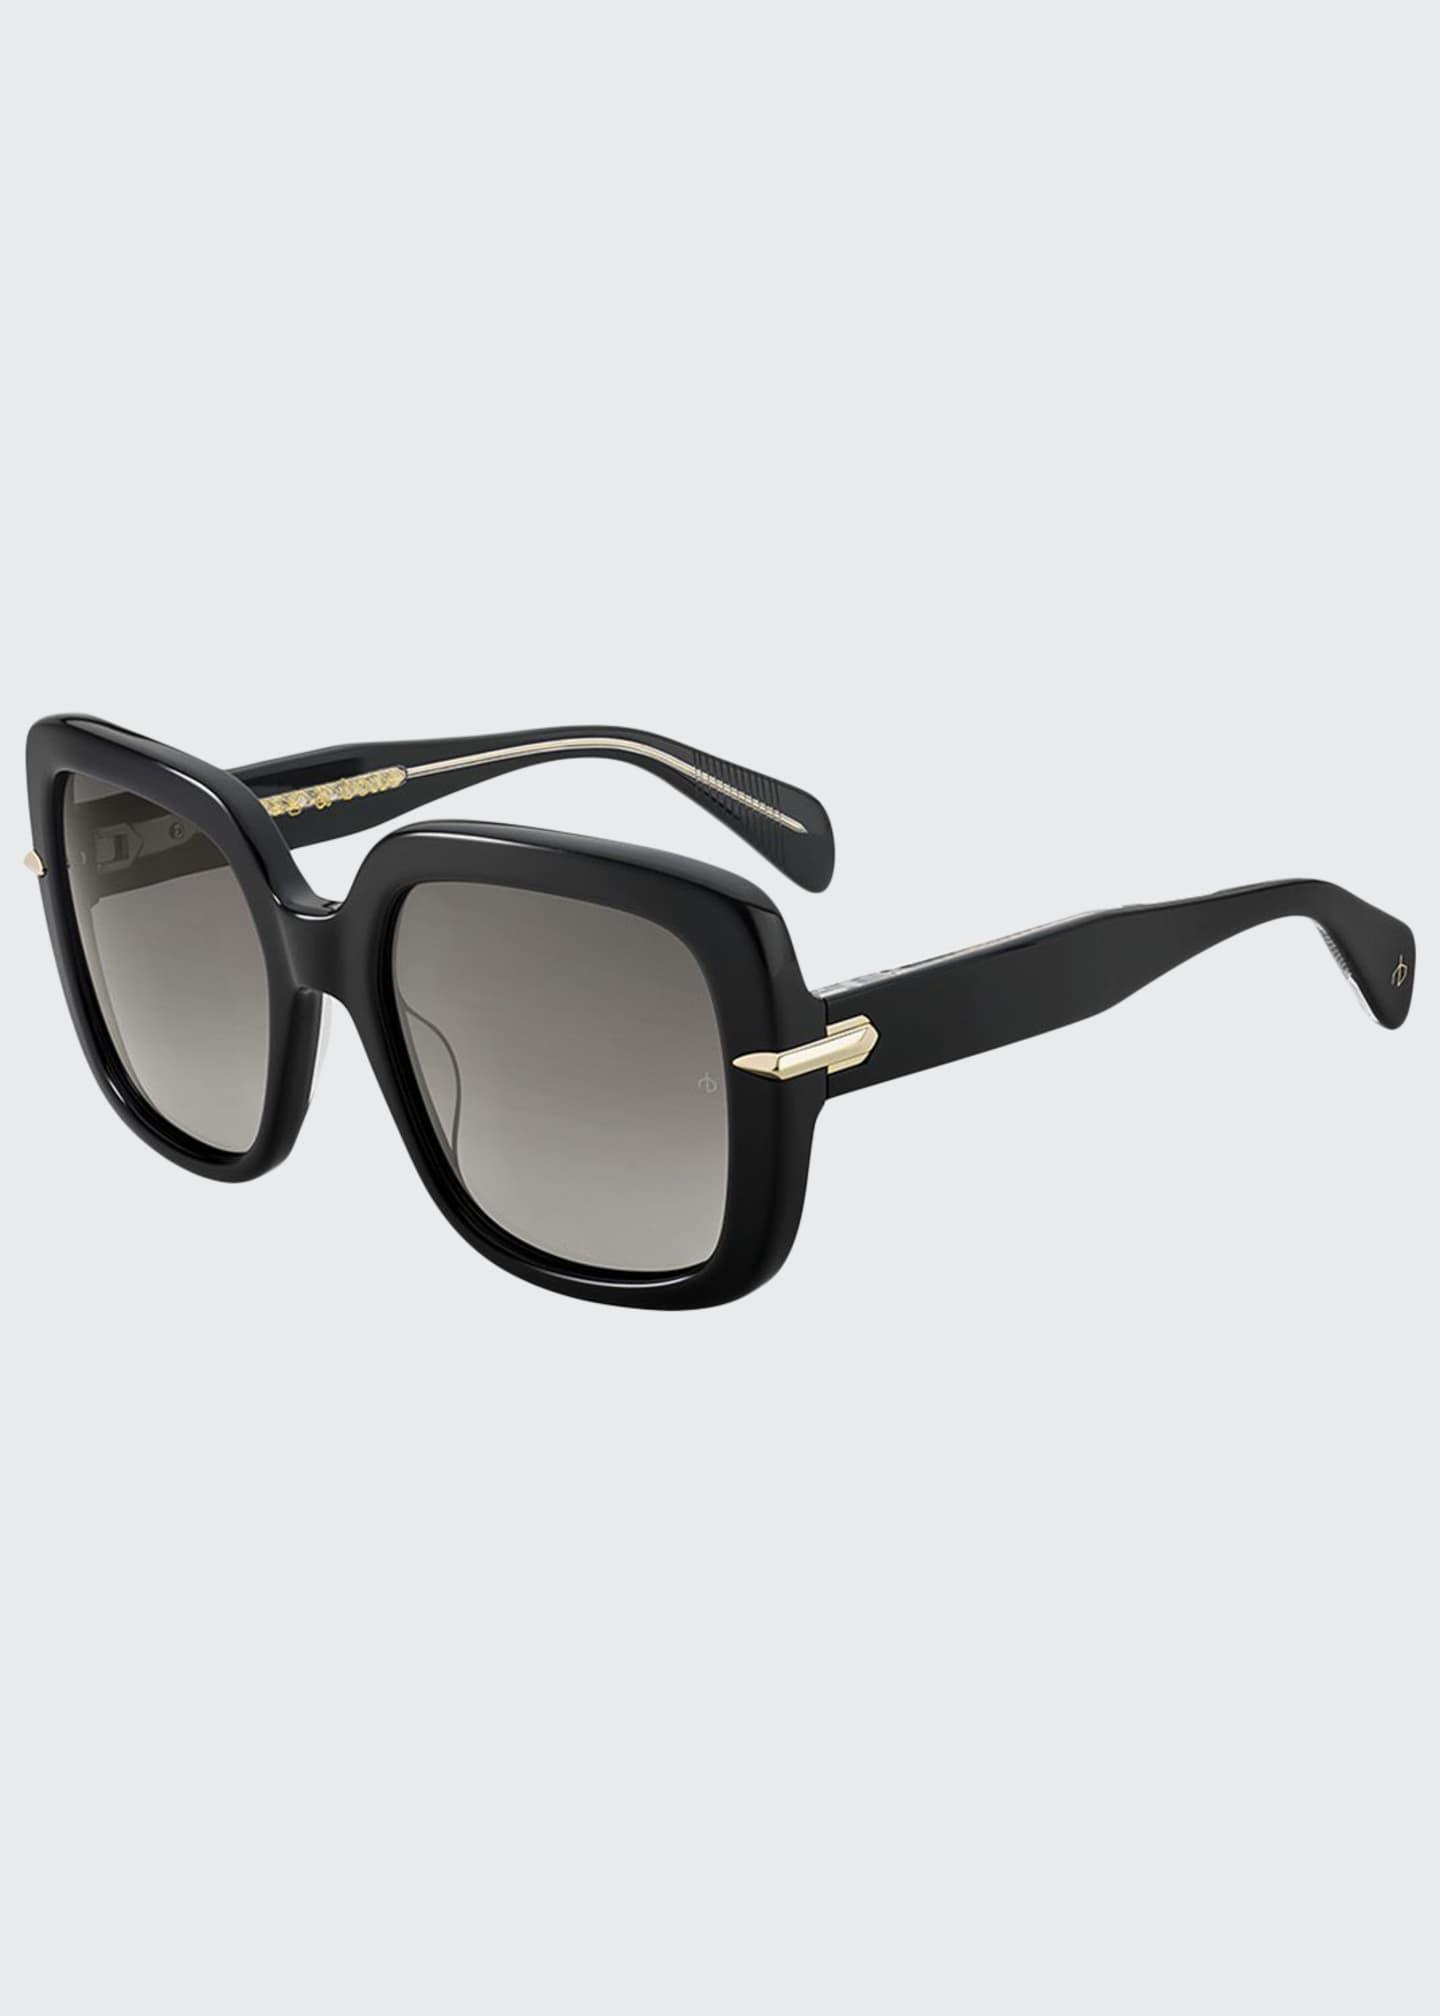 Rag & Bone Square Polarized Acetate Sunglasses w/